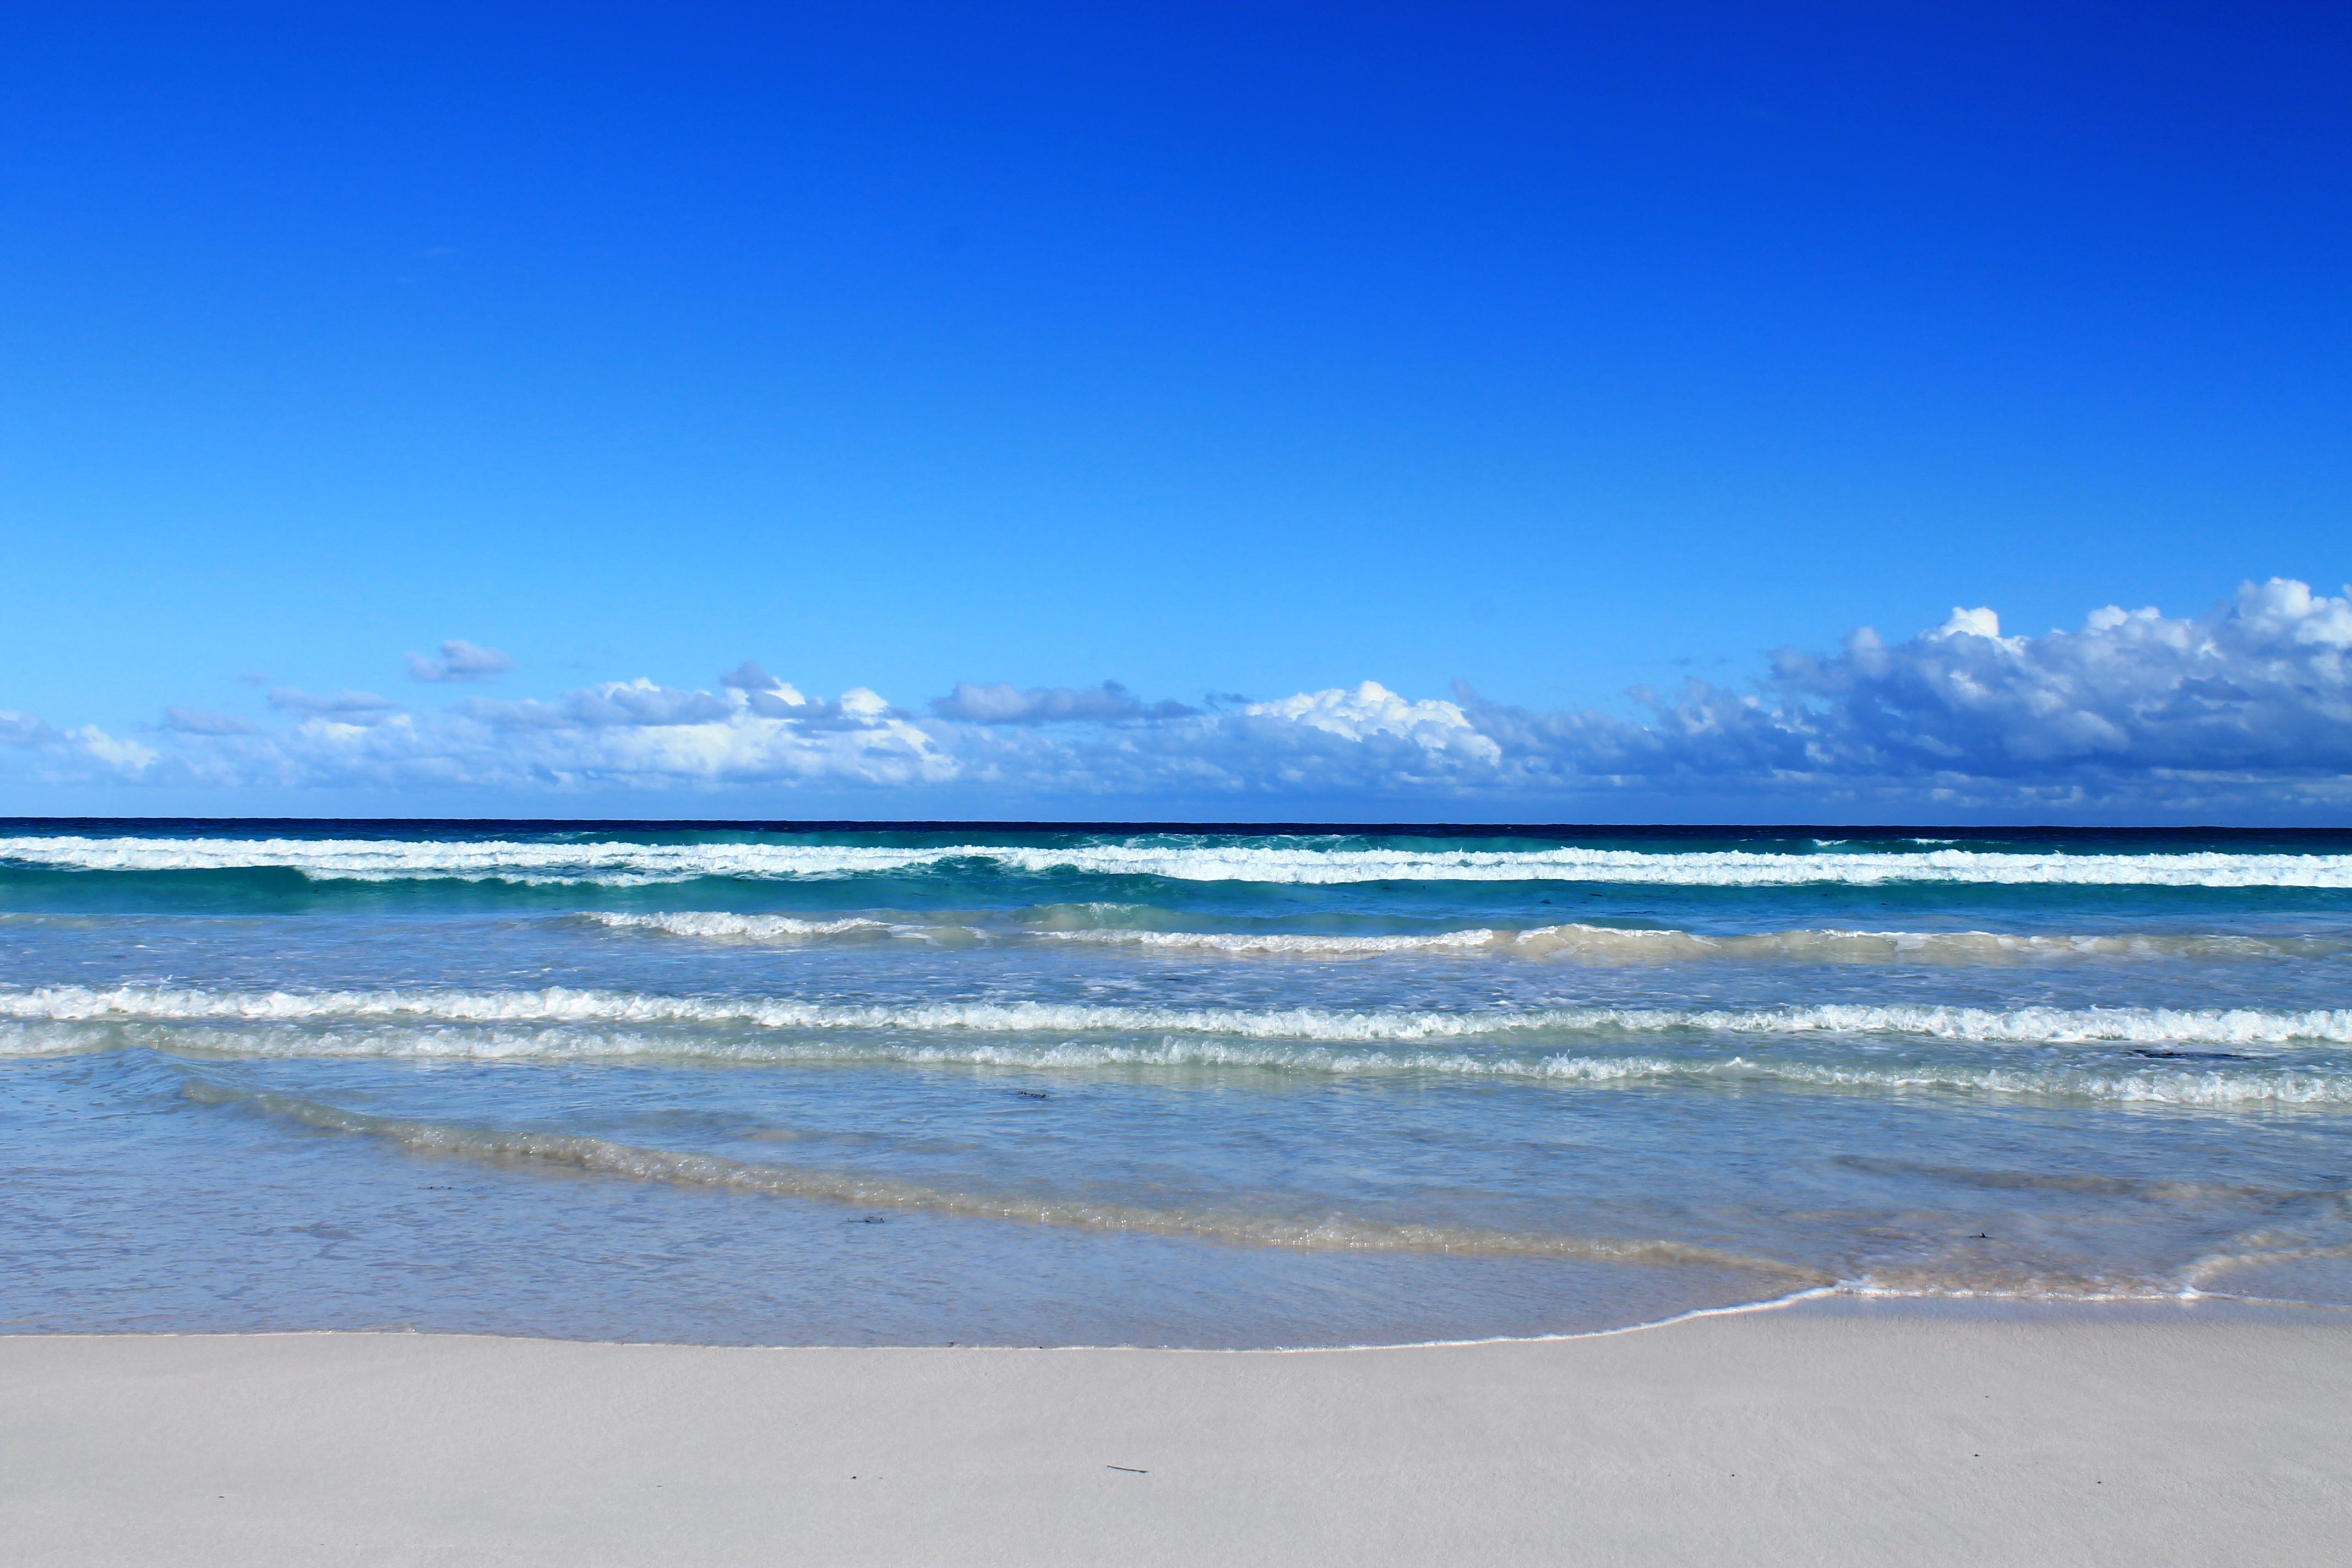 Free Images : beach, coast, sand, ocean, horizon, sky, shore, summer